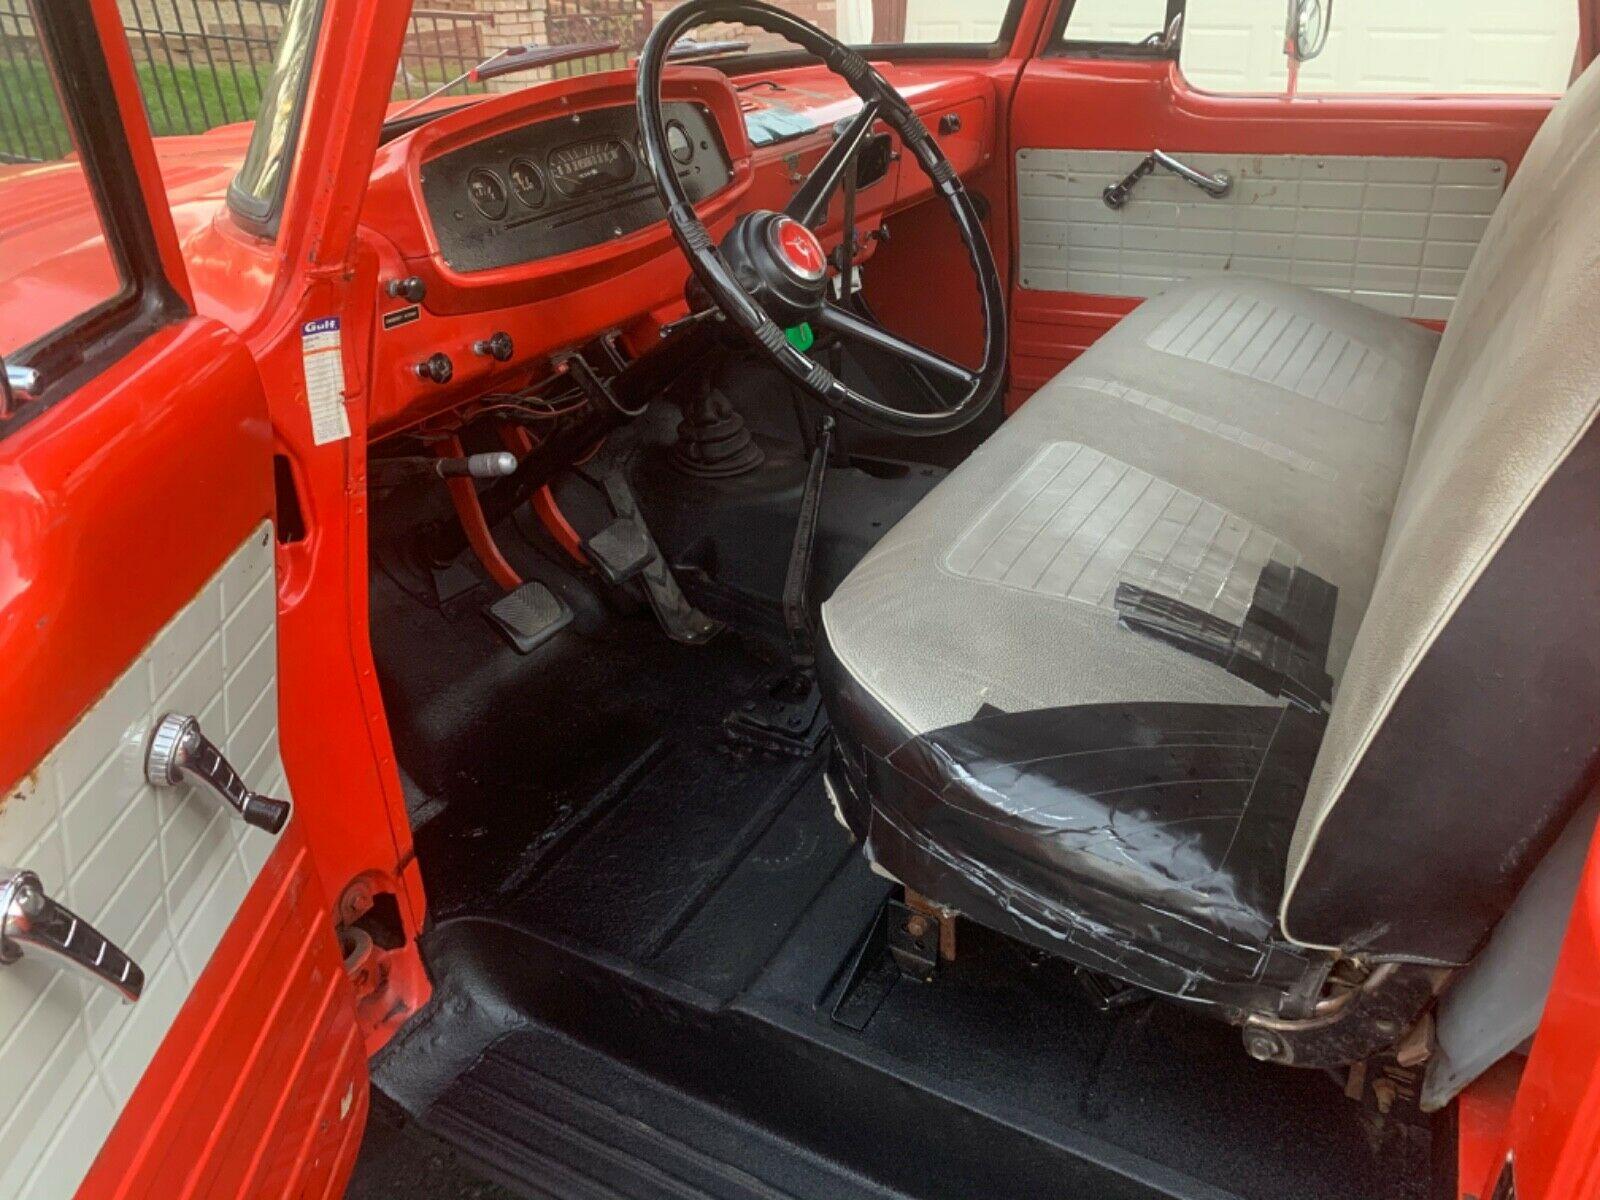 1964 Dodge W200 Power Wagon interior